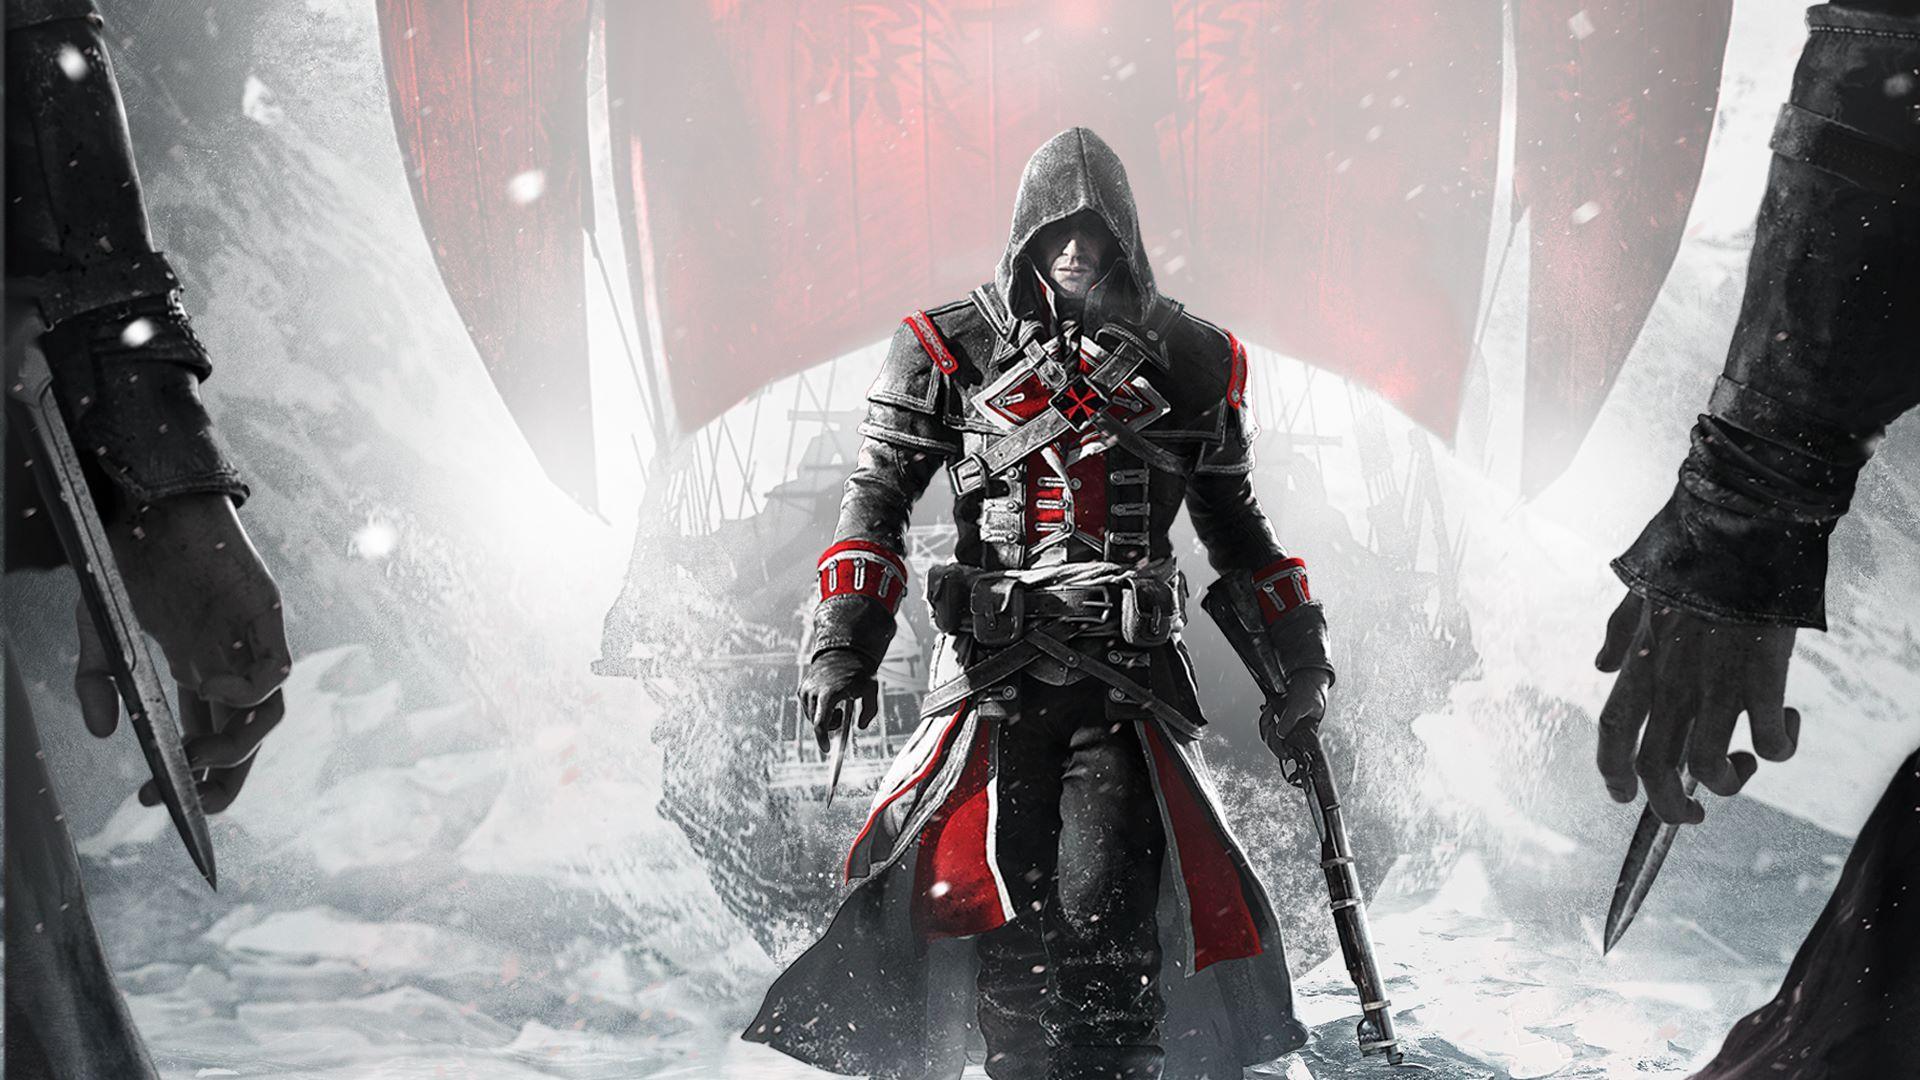 assassins creed unity outfits unlock cheat